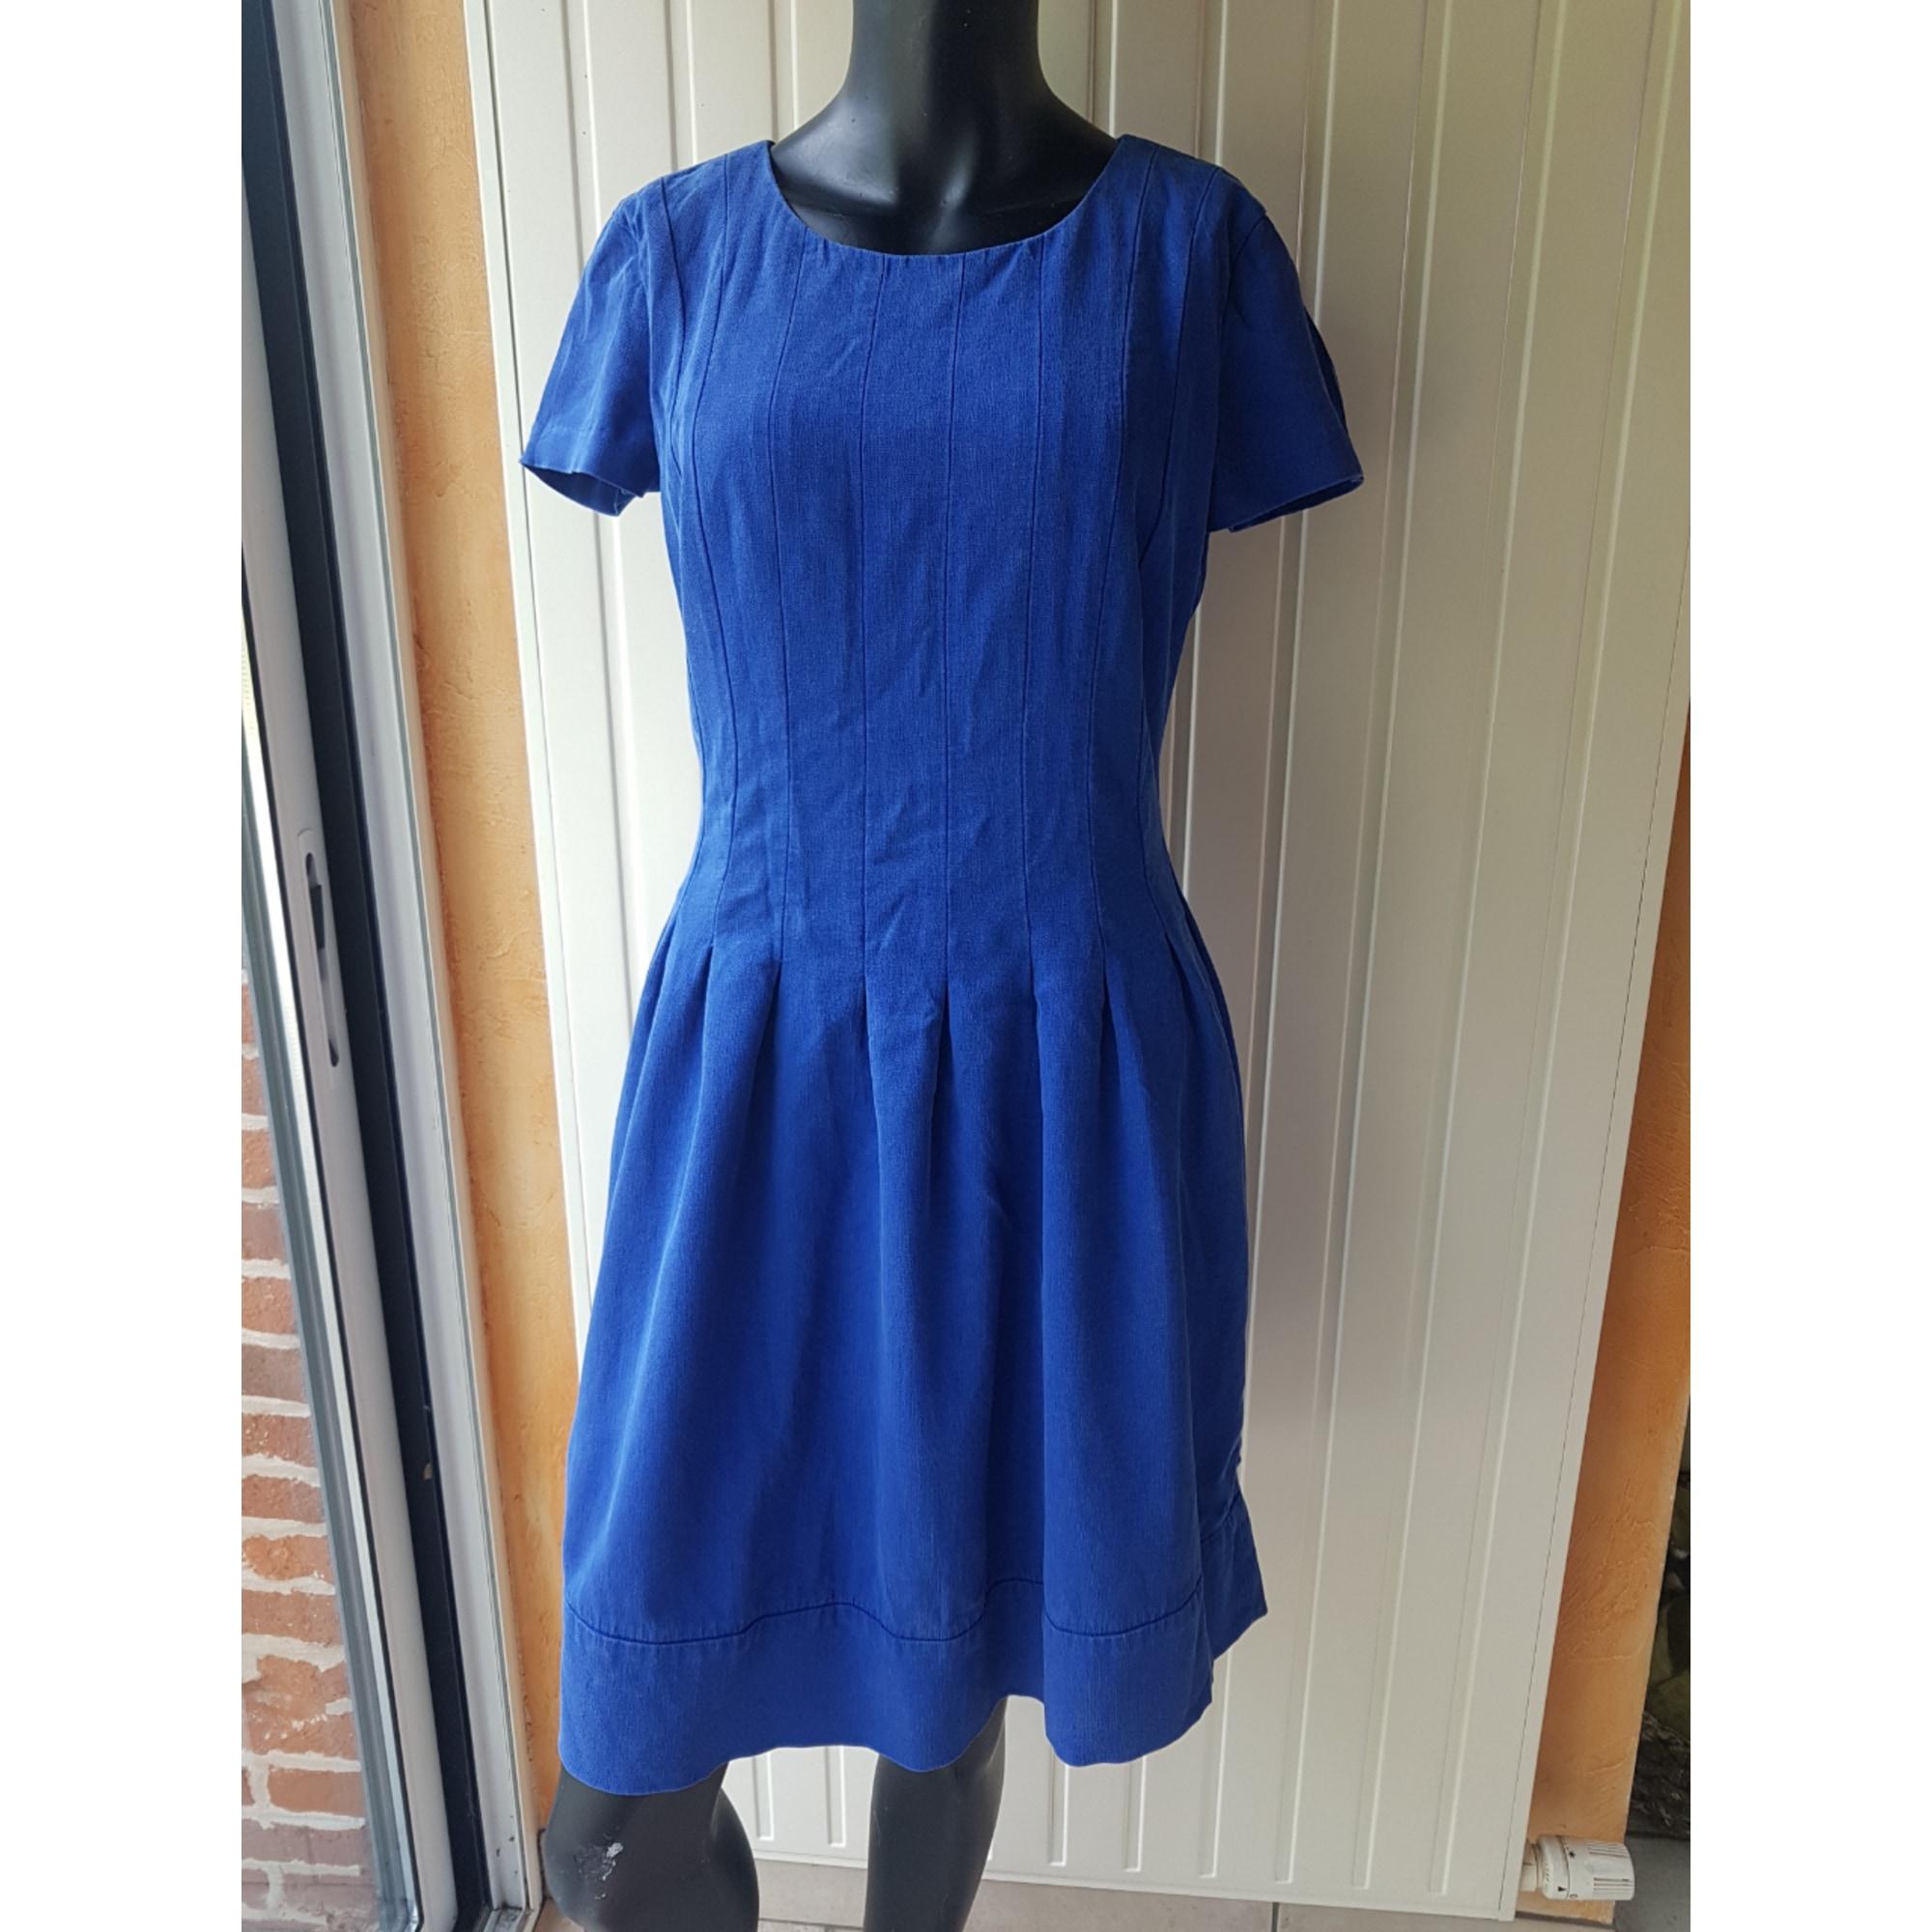 Robe courte ARMANI JEANS Bleu, bleu marine, bleu turquoise